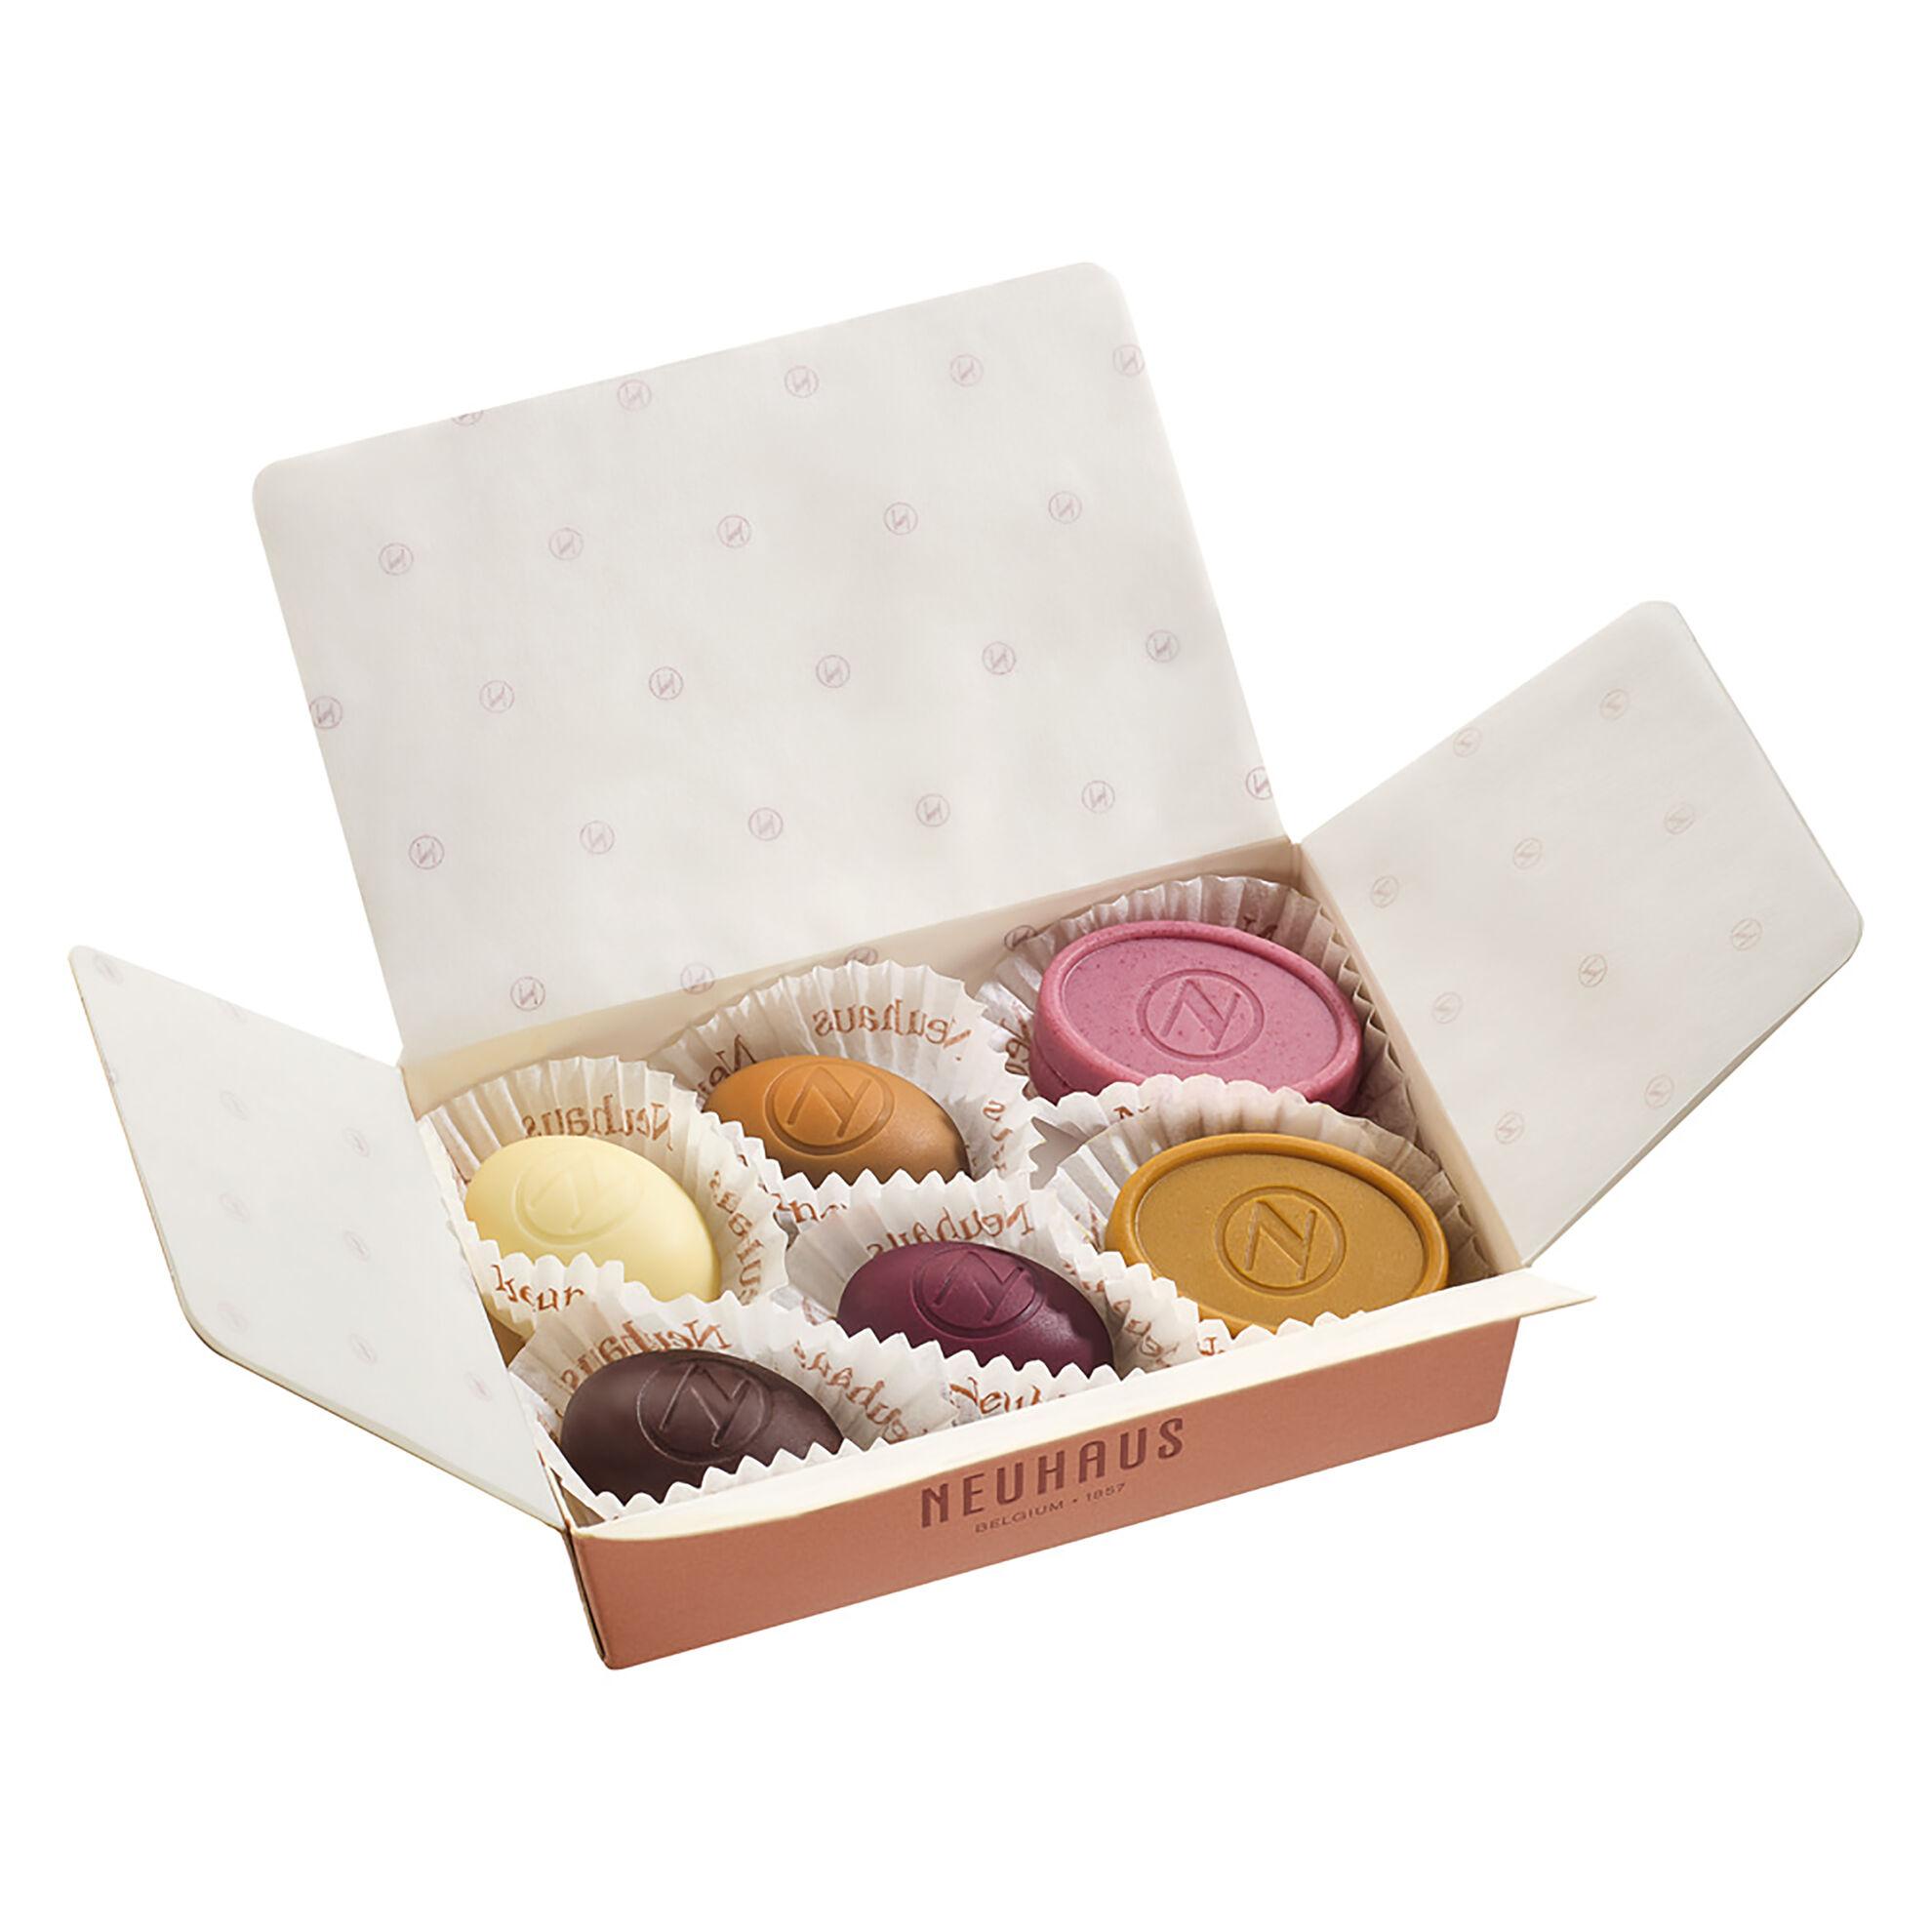 Chocolate Duets Mini Ballotin image number 01